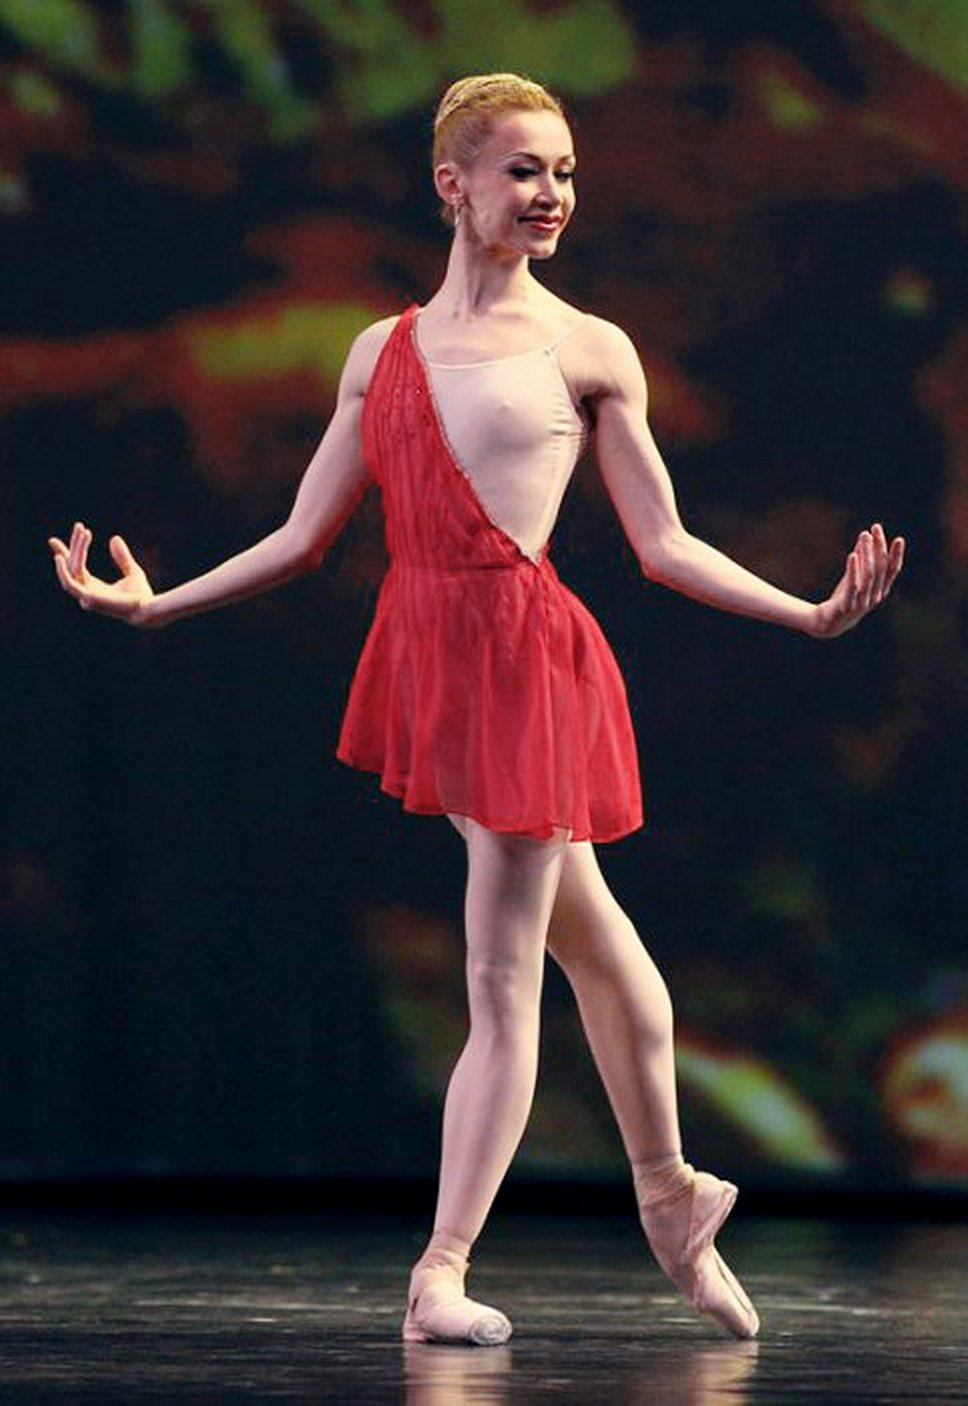 Фестиваль Dance Open в Савонлинне